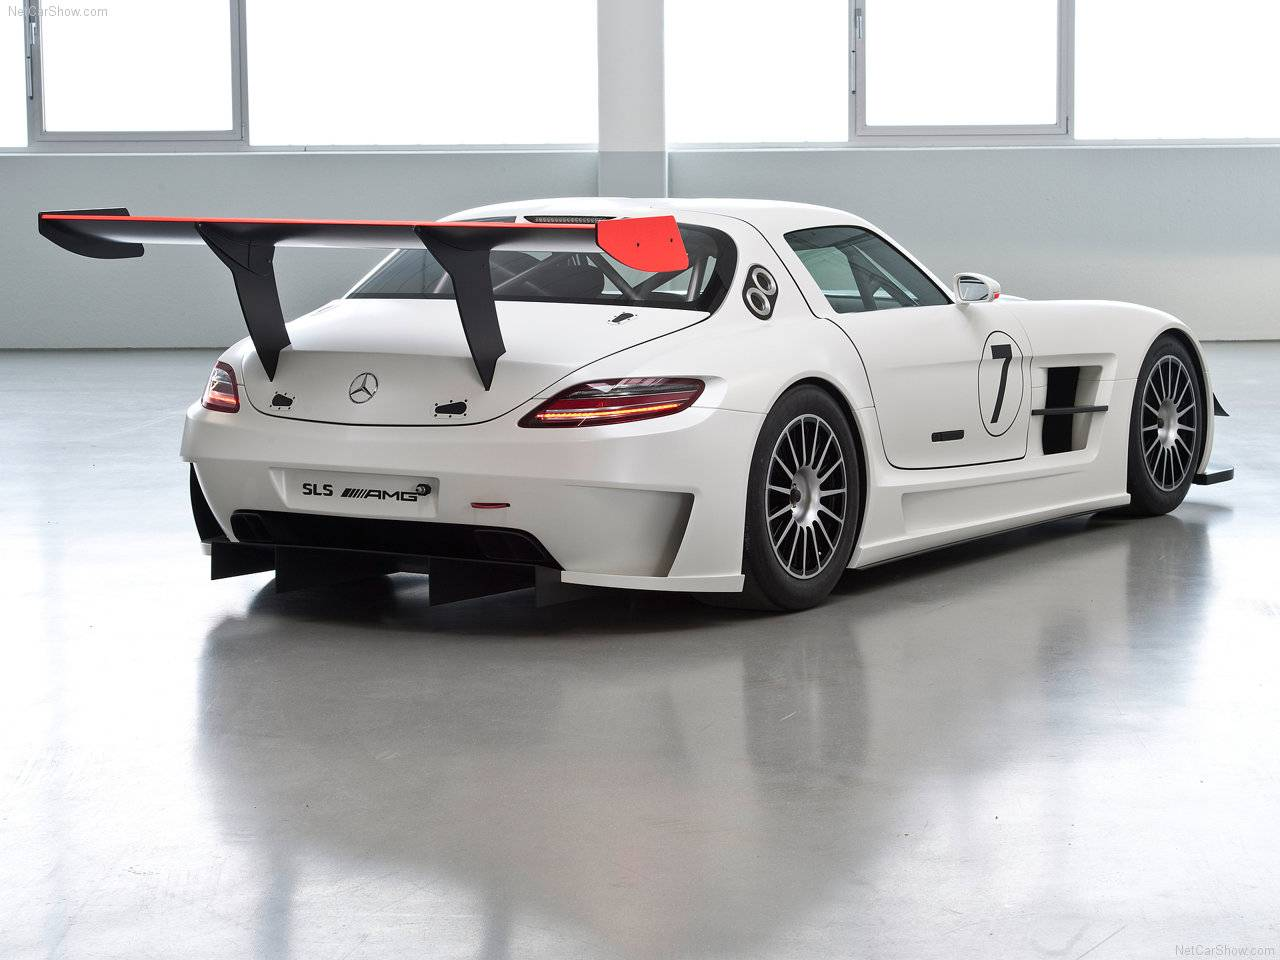 http://4.bp.blogspot.com/_lsyt_wQ2awY/TDLa_1bMsZI/AAAAAAAB6hI/8nUnZnAtEJQ/s1600/Mercedes-Benz-SLS_AMG_GT3_2011_1280x960_wallpaper_04.jpg